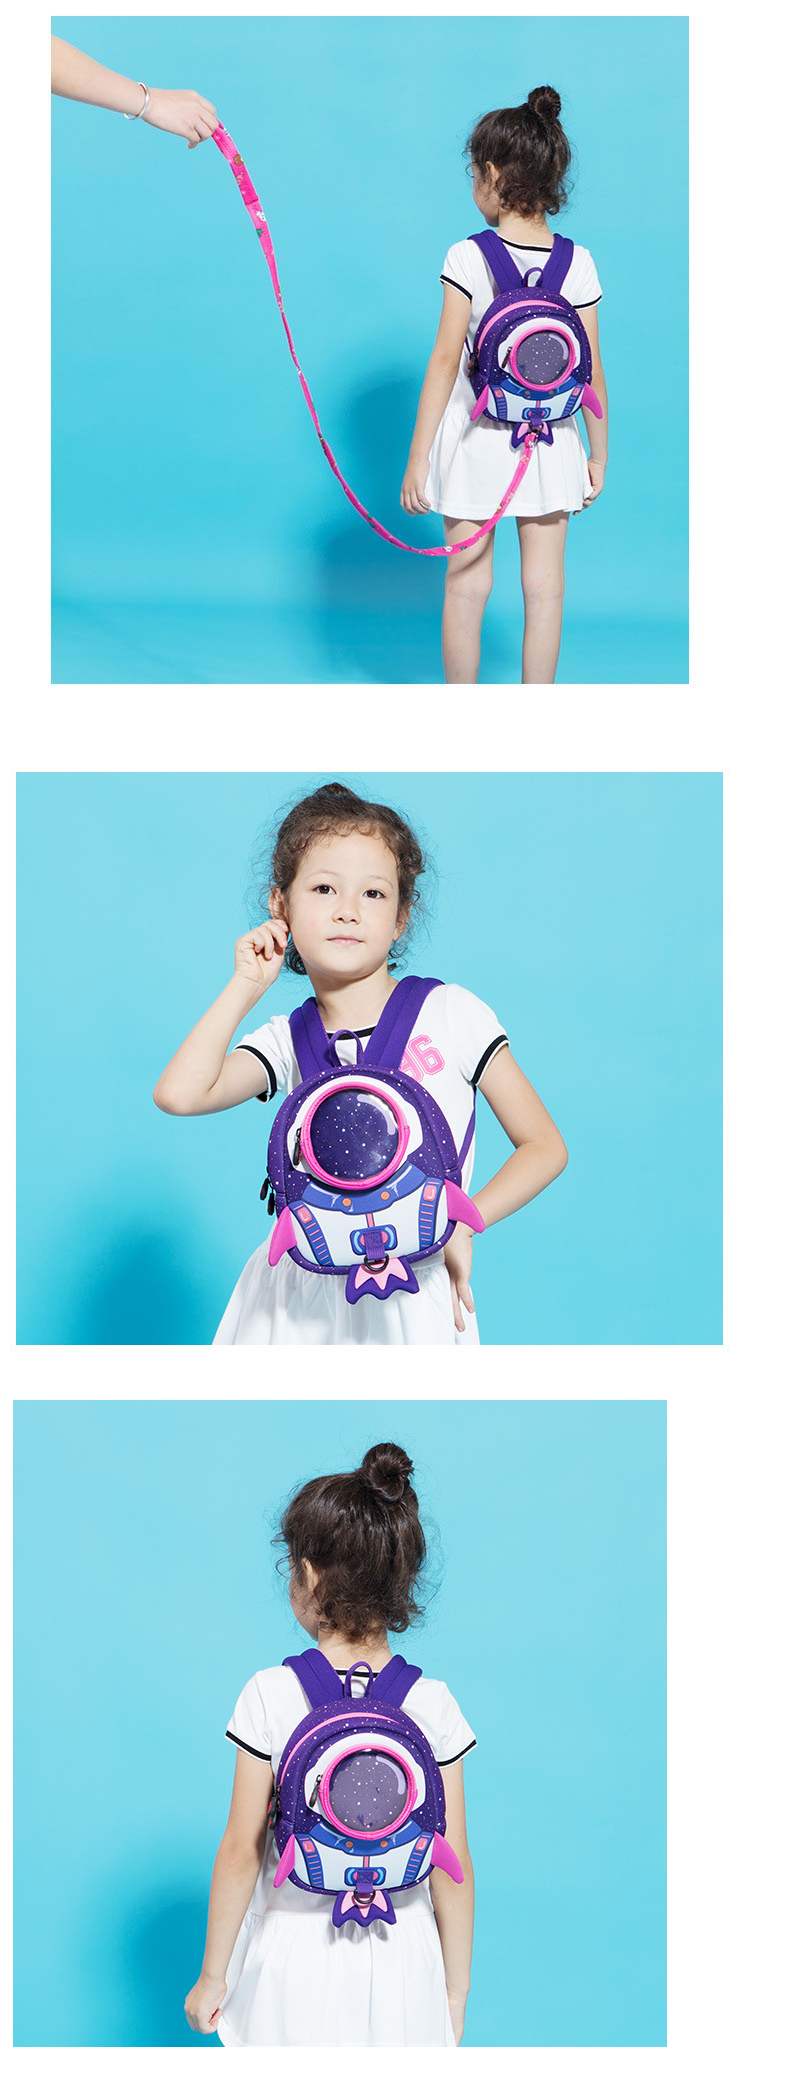 UEK Rocket Kids Backpack (Purple)